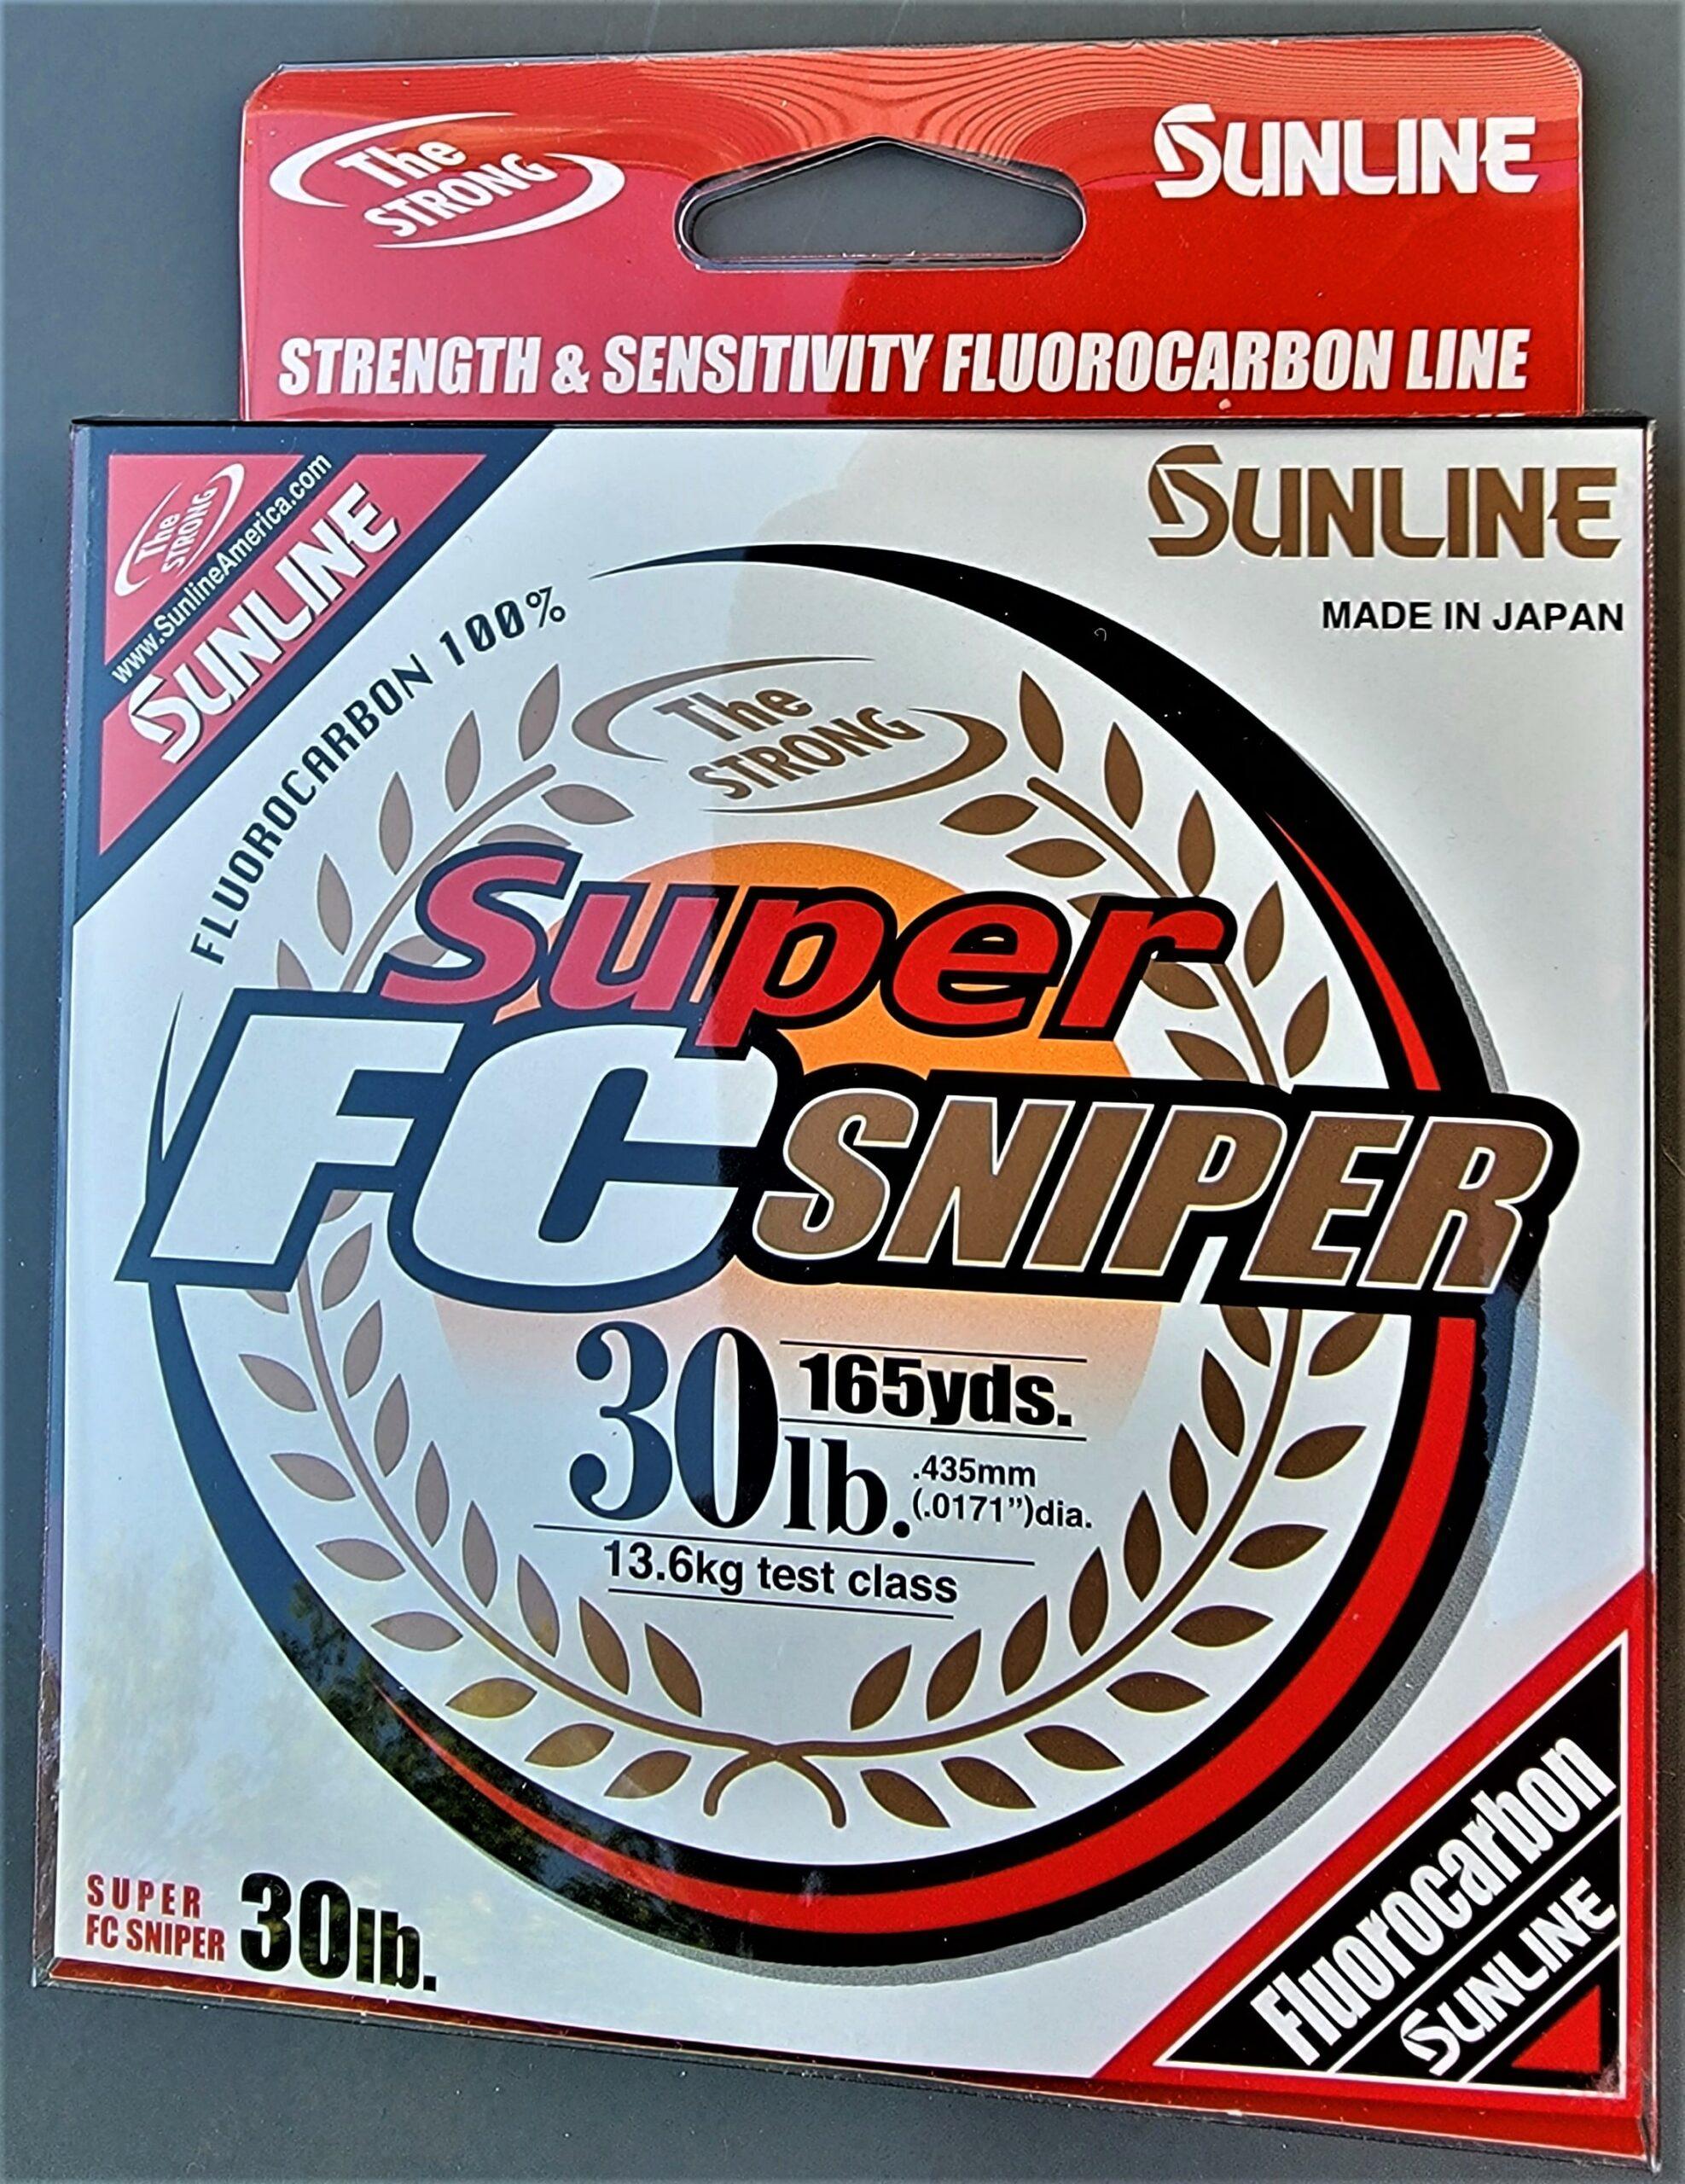 Sunline - Super FC Sniper - 165 YD - Super FC Sniper - 30 LB - Natural Clear